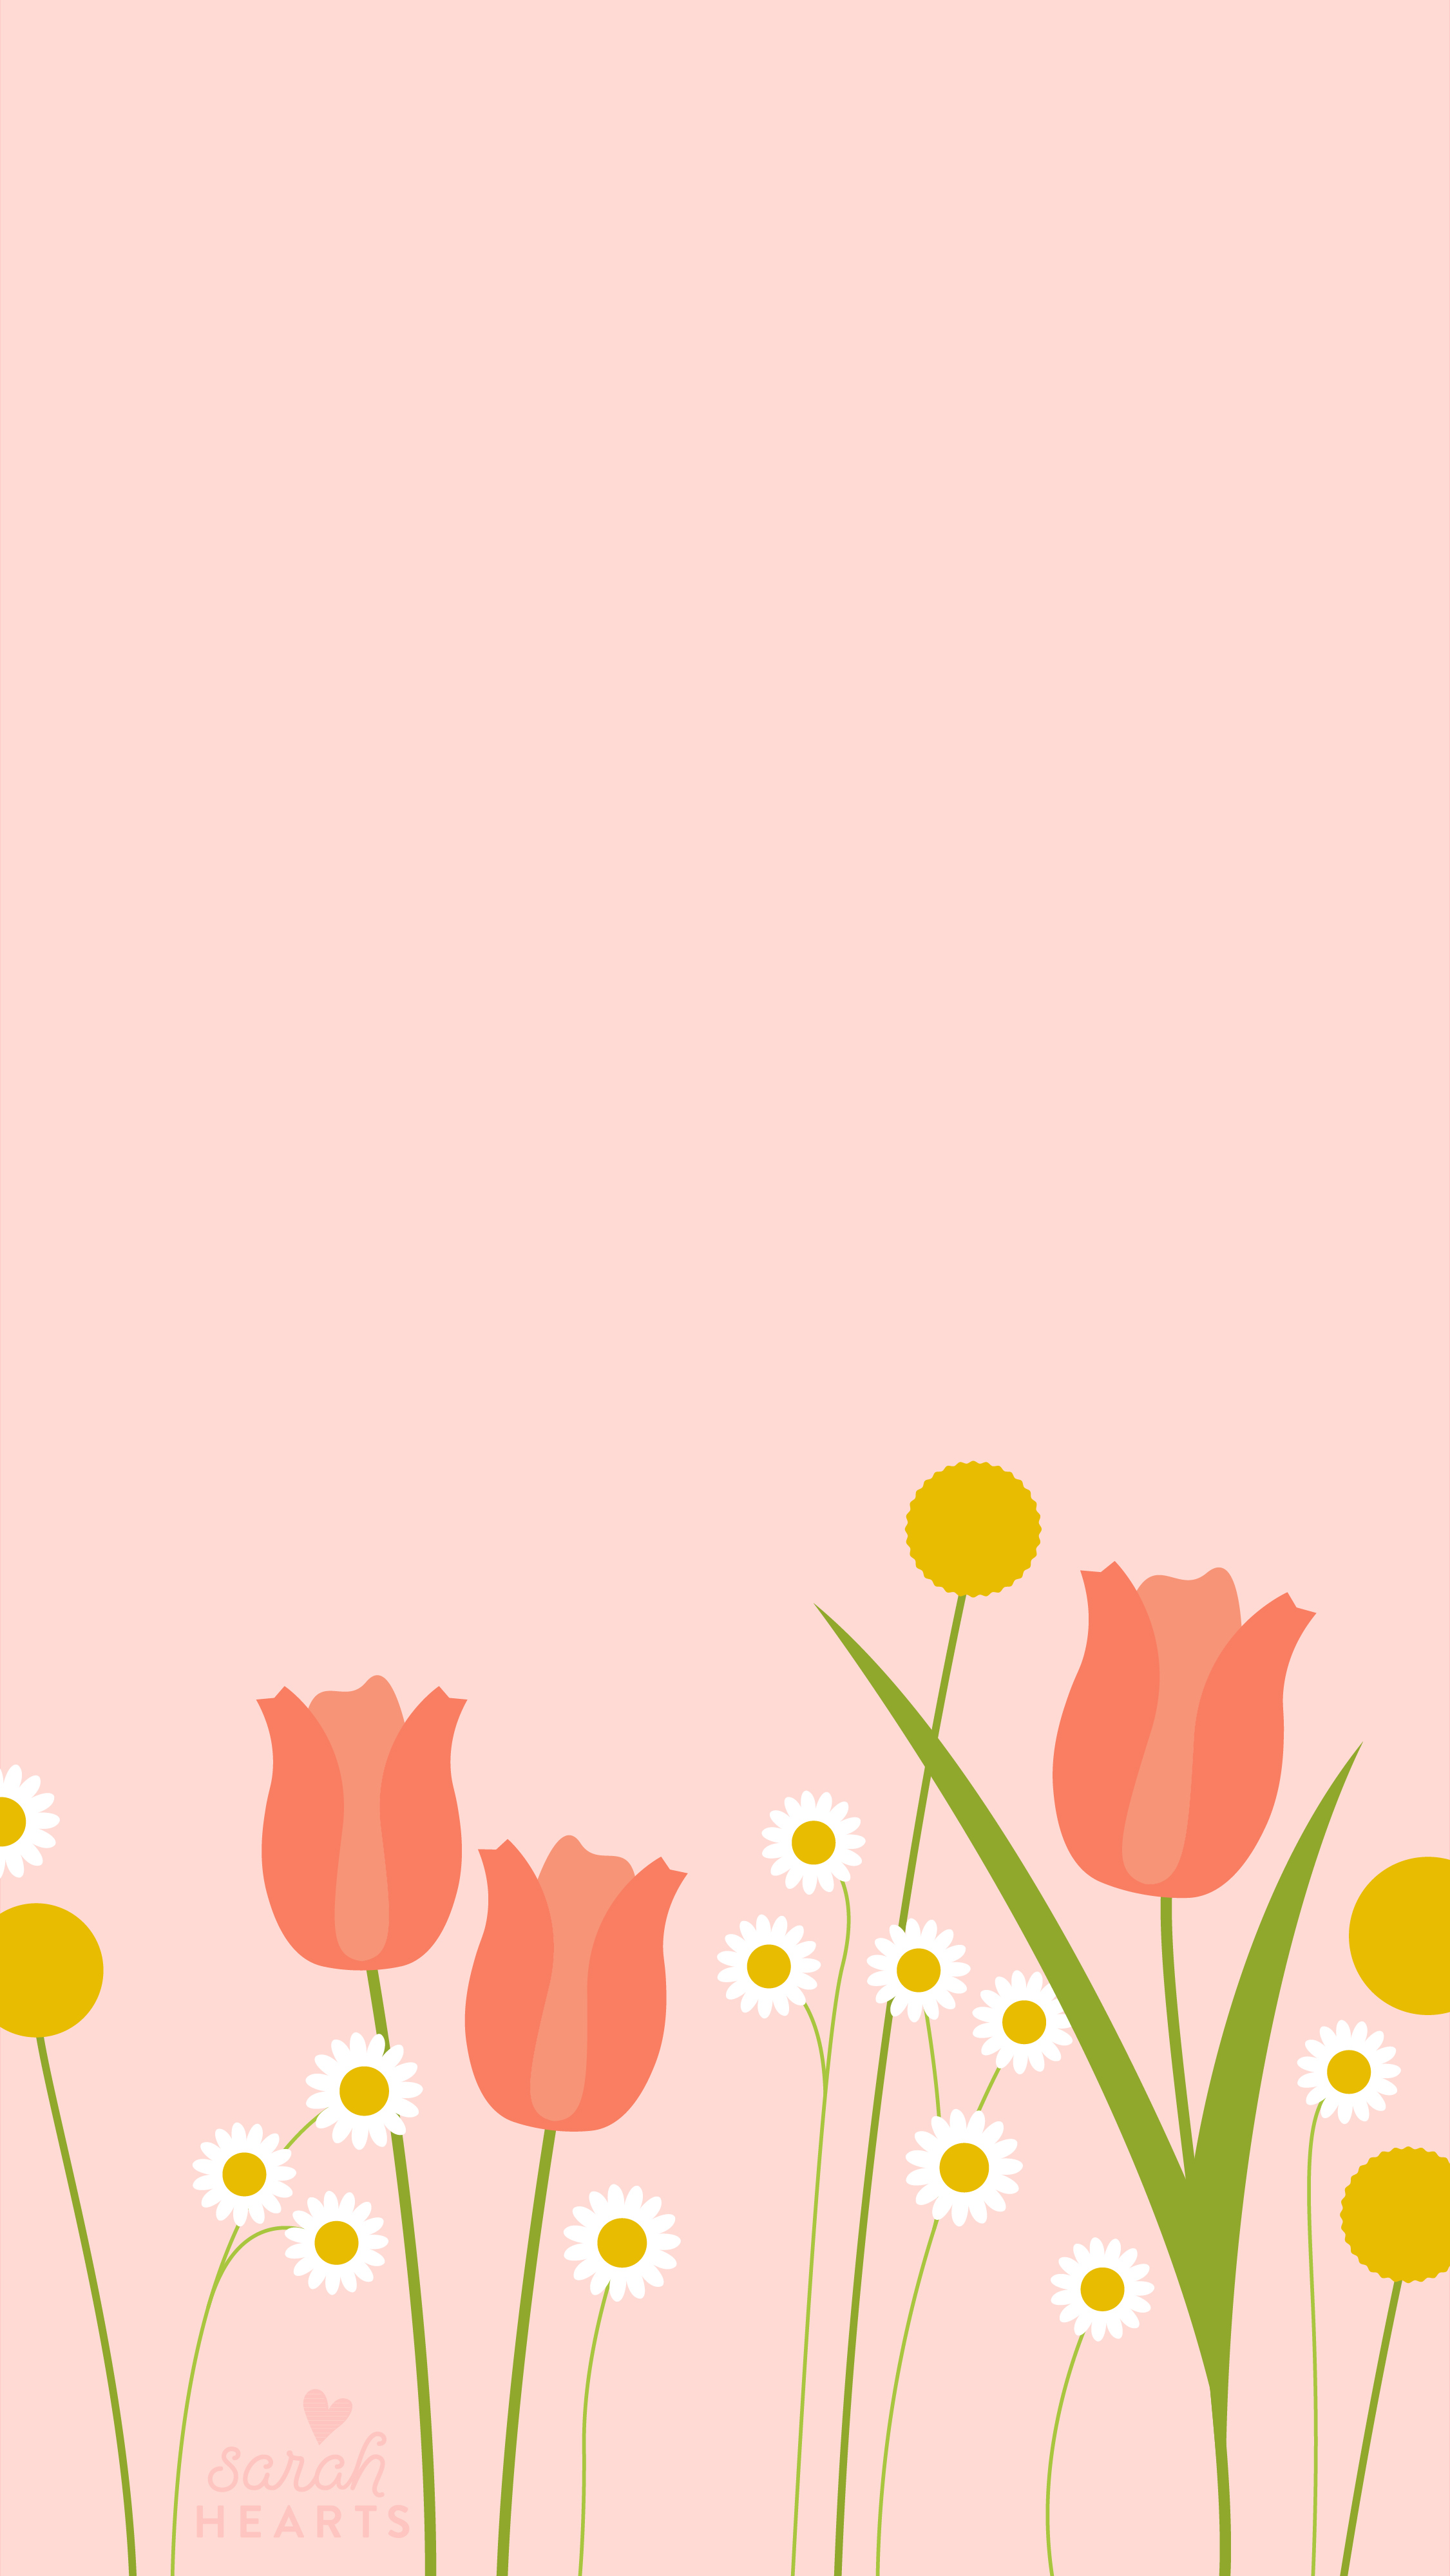 Graphic Designer Quote Wallpaper May 2017 Calendar Wallpaper Sarah Hearts